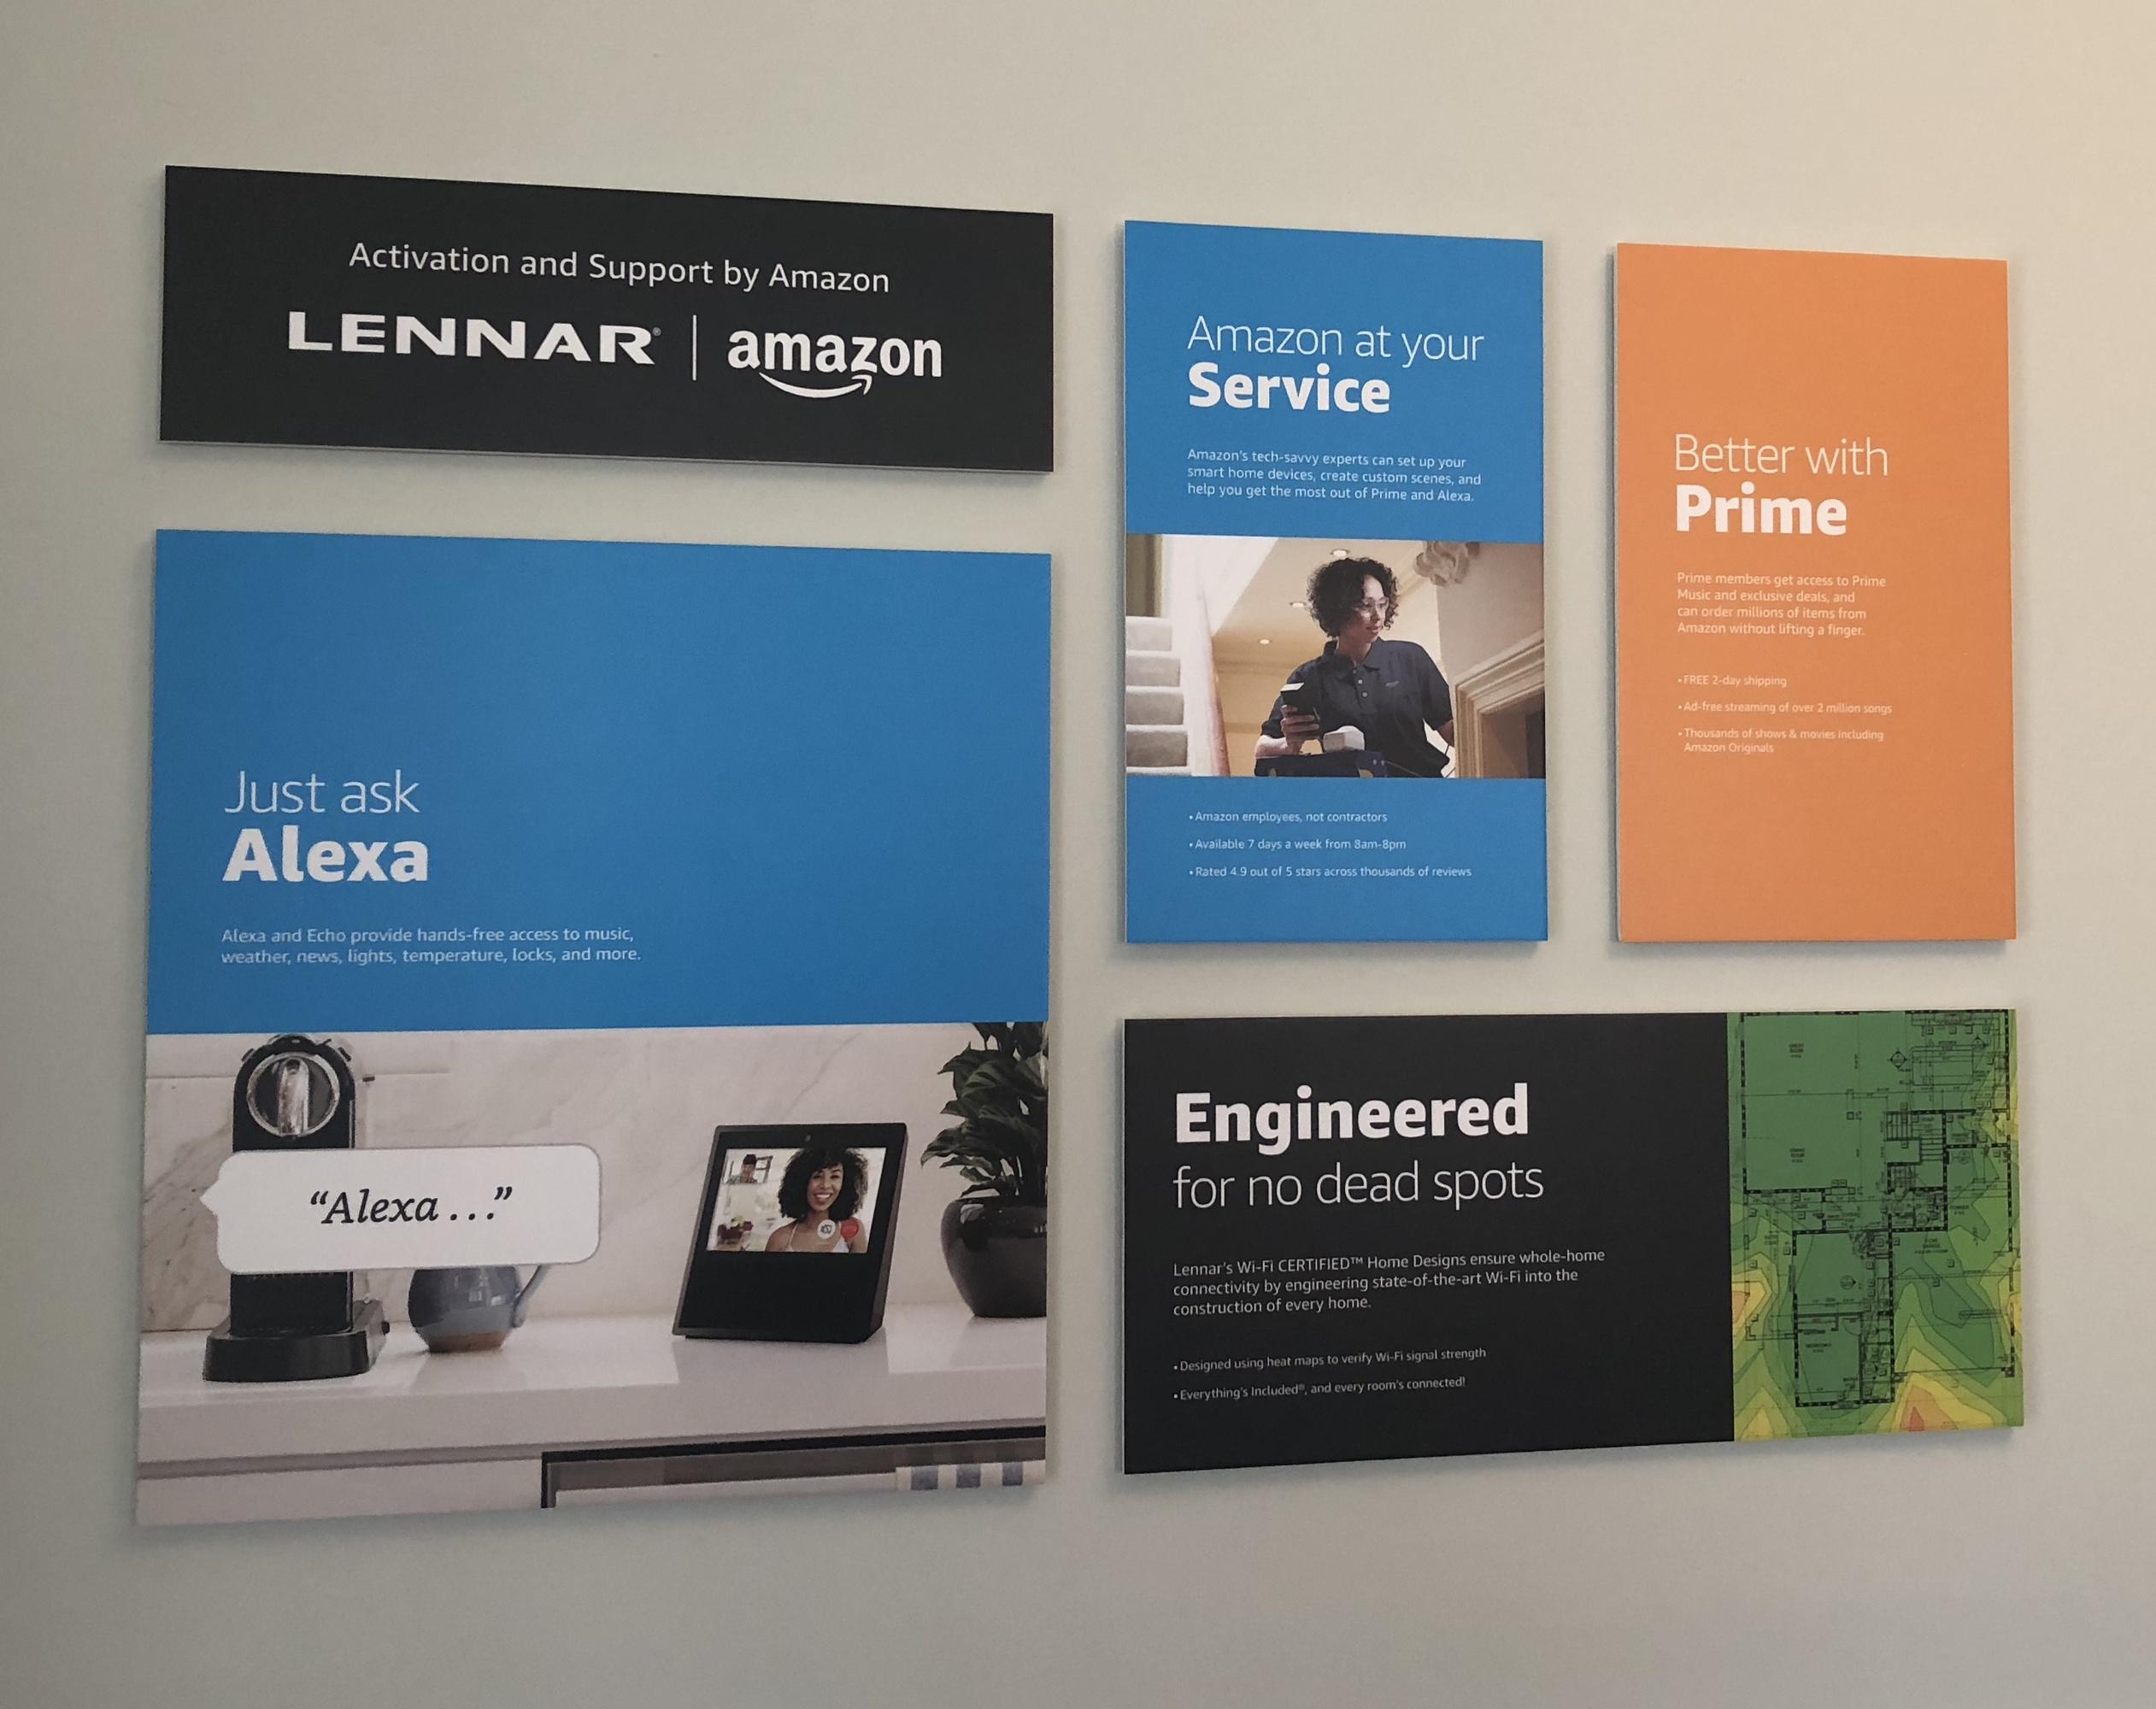 Lennar Amazon signs